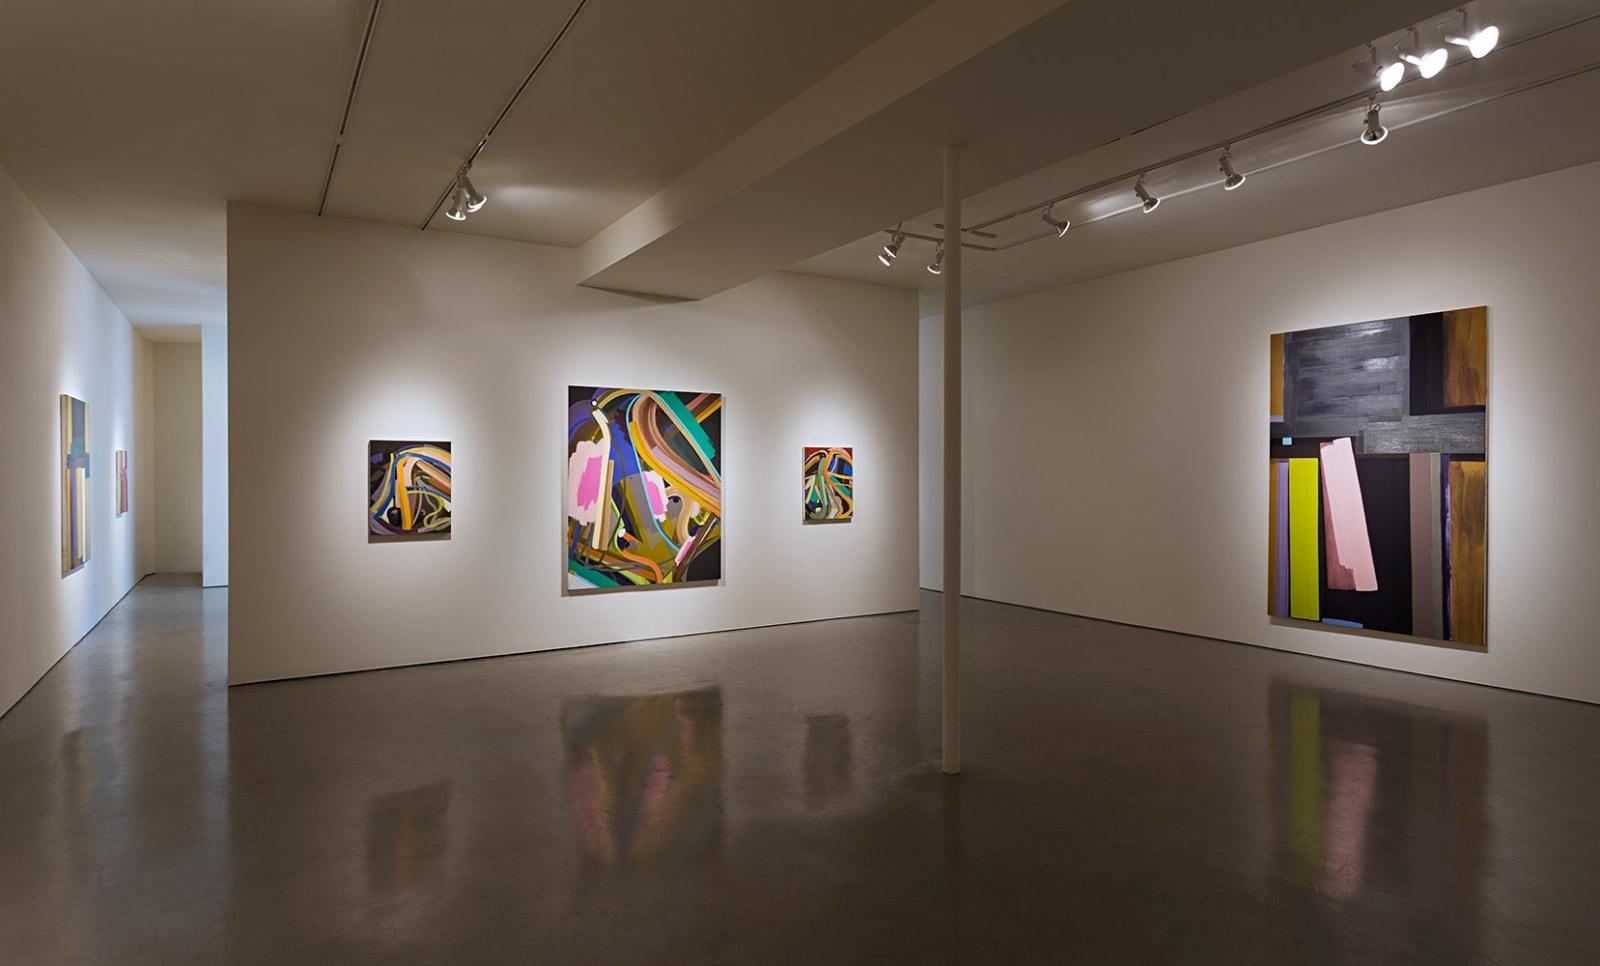 John Millei | Anthropomorphic Abstraction